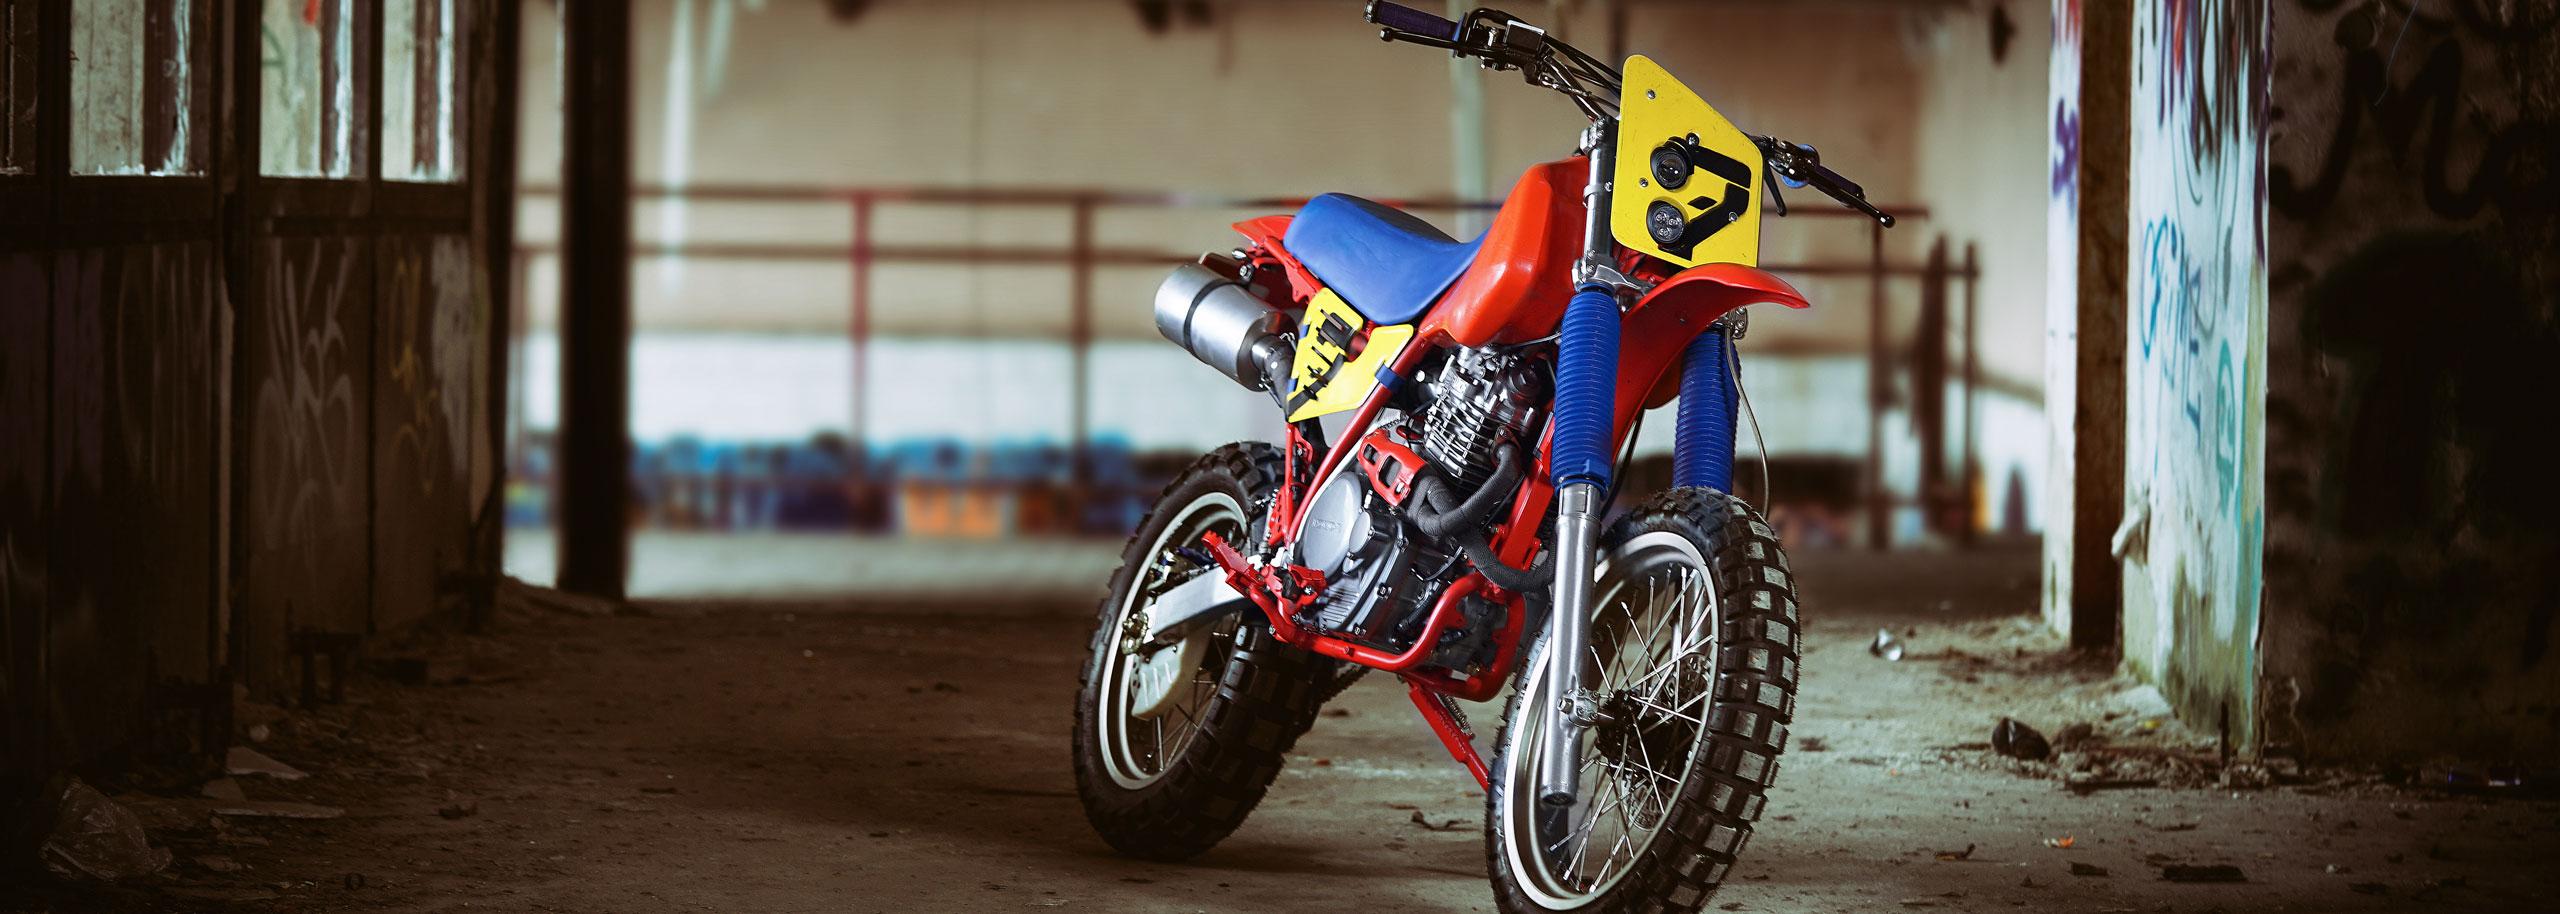 03_Urban-Crosser-Honda-XR600-Titan-Motorcycle-Co-Austria-Typisiert-Graz-Custom-Bikes-made-in-Styria-Austria